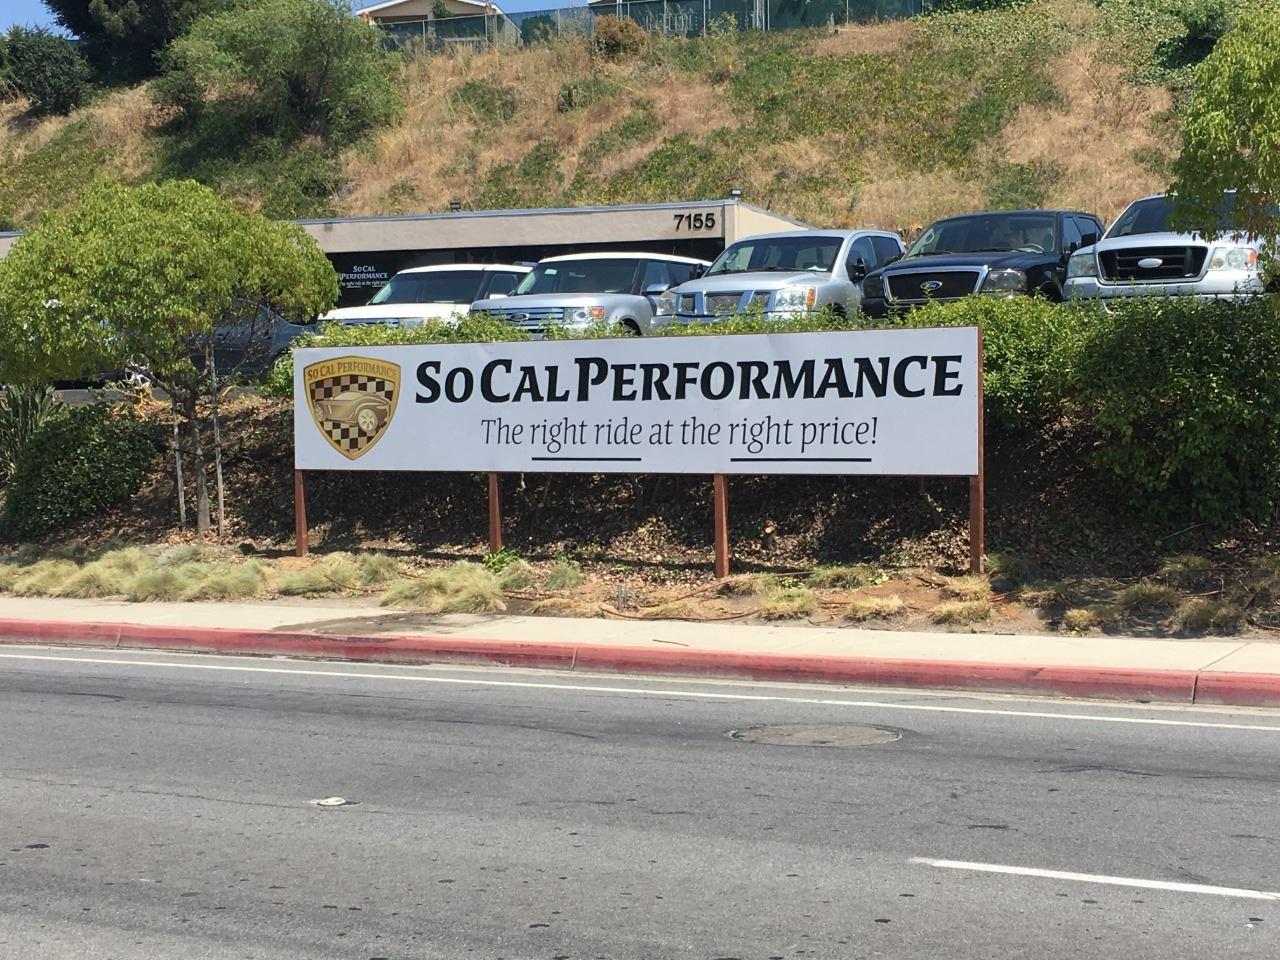 So Cal Performance